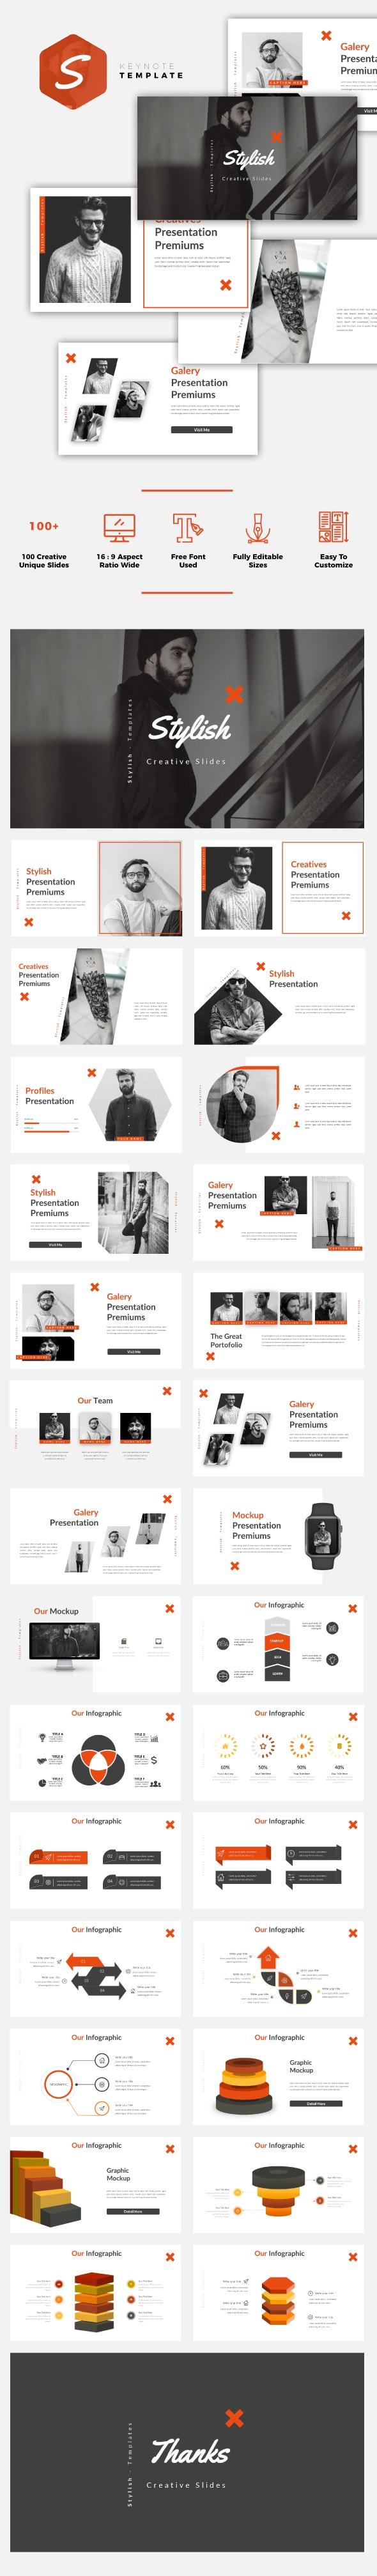 Stylish - Creative Keynote Template - Creative Keynote Templates